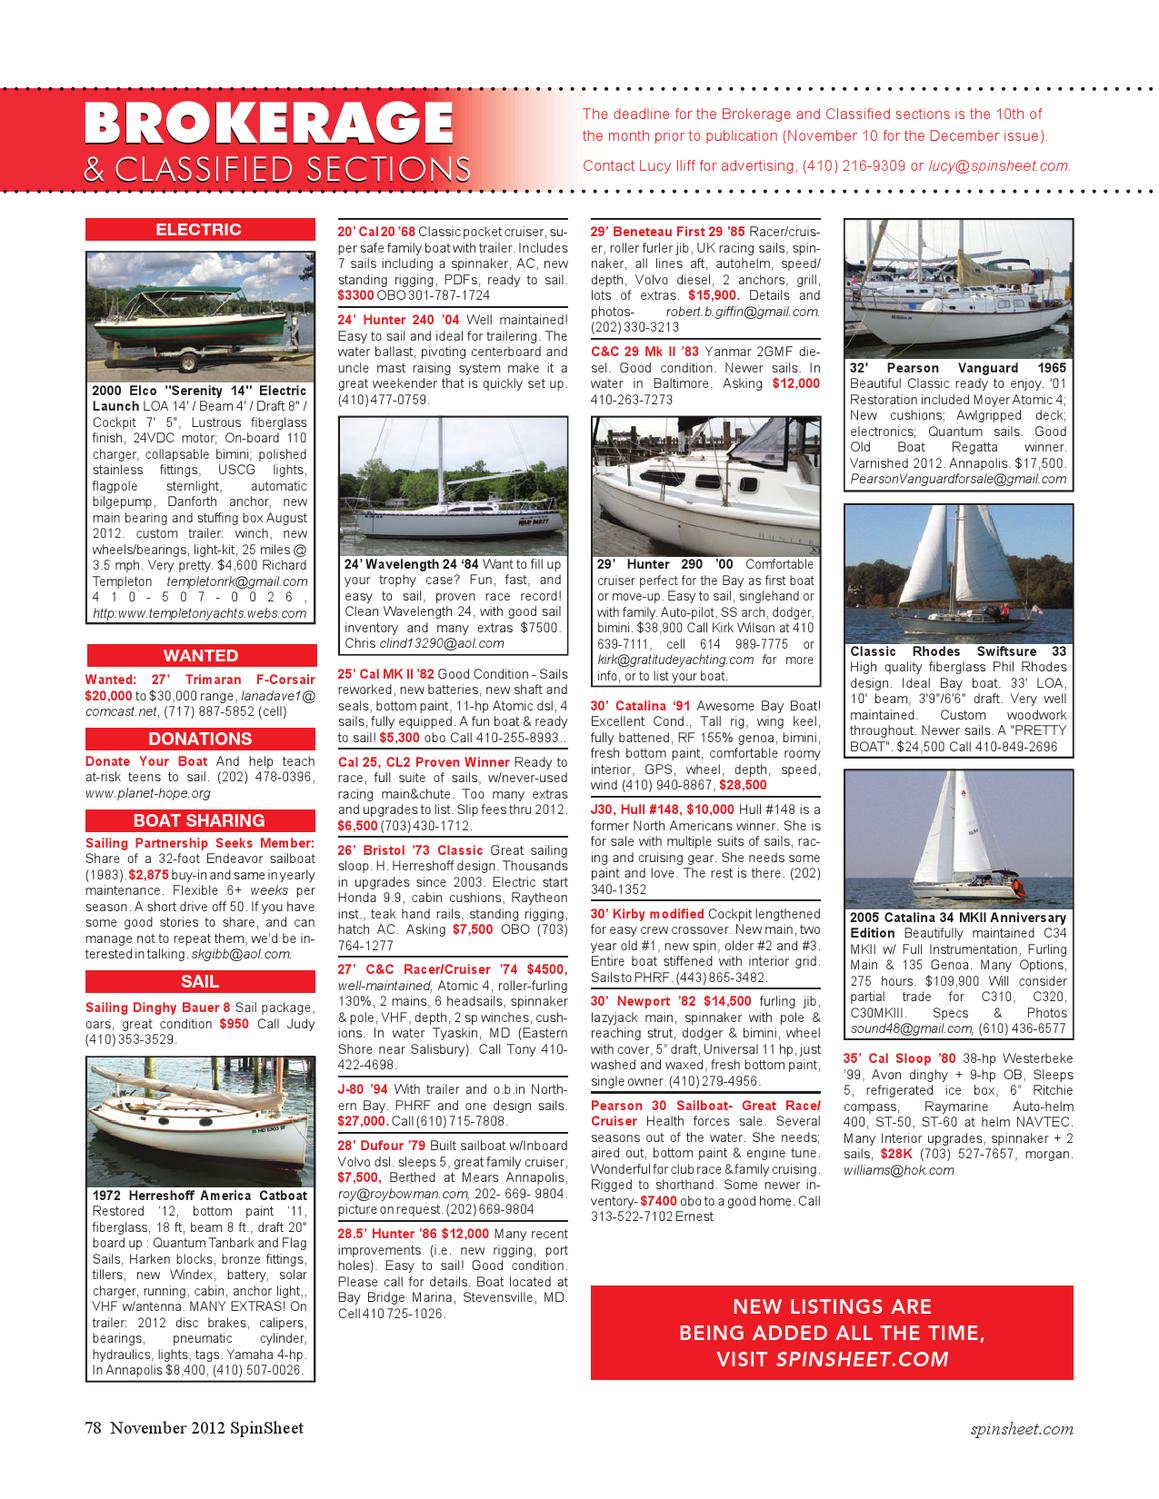 SpinSheet November 2012 by SpinSheet Publishing Company - issuu